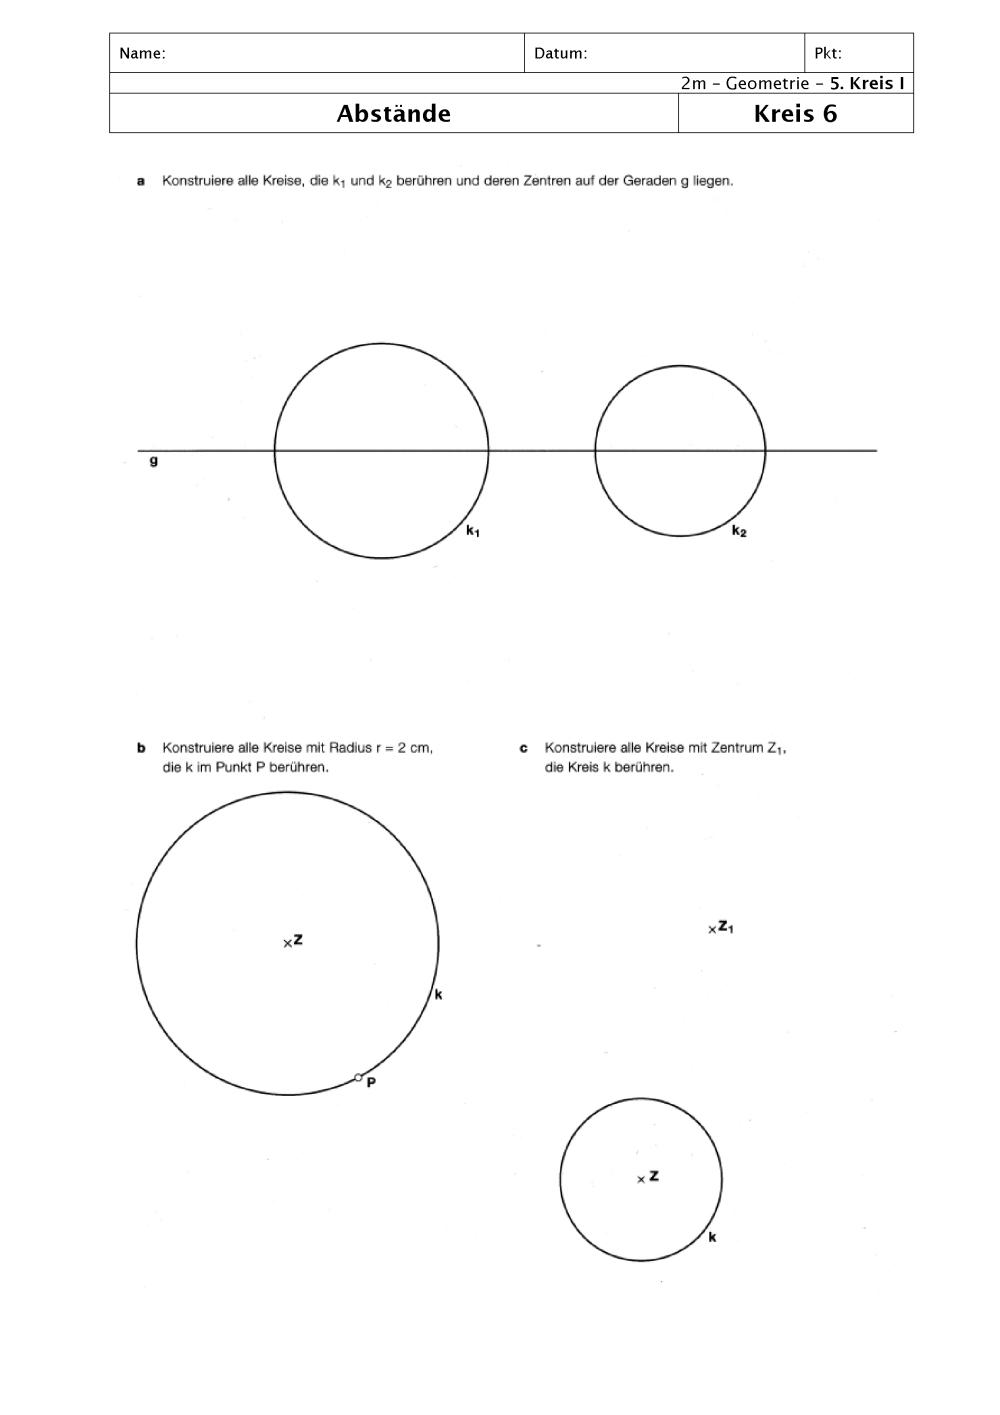 Wunderbar Berühren Punkt Mathe Arbeitsblatt Galerie - Mathe ...